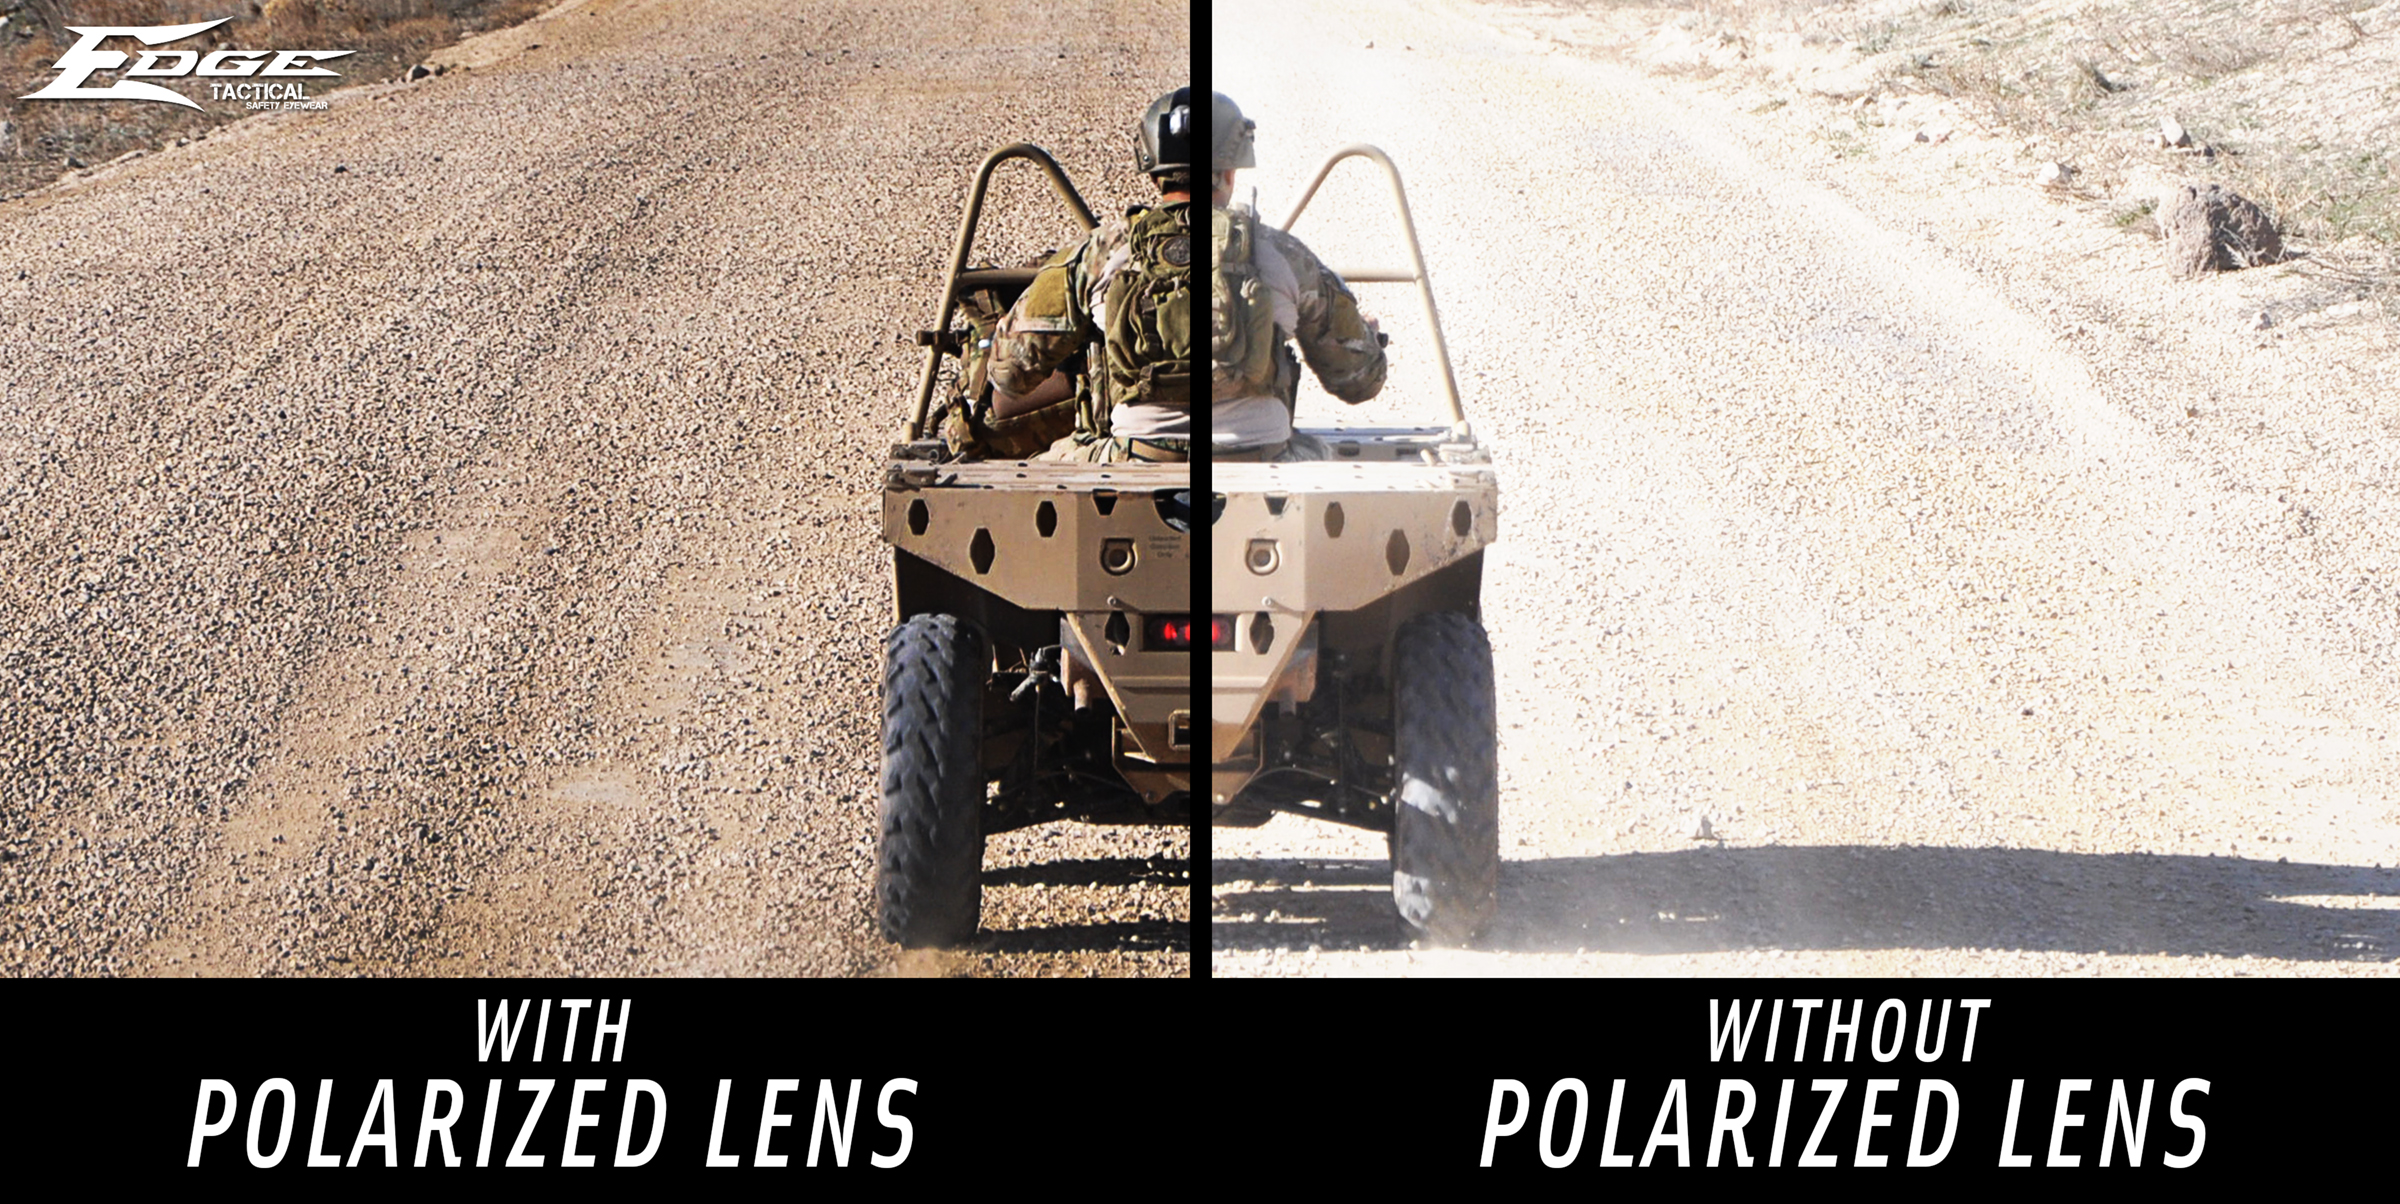 polarizedgraphic1.jpg